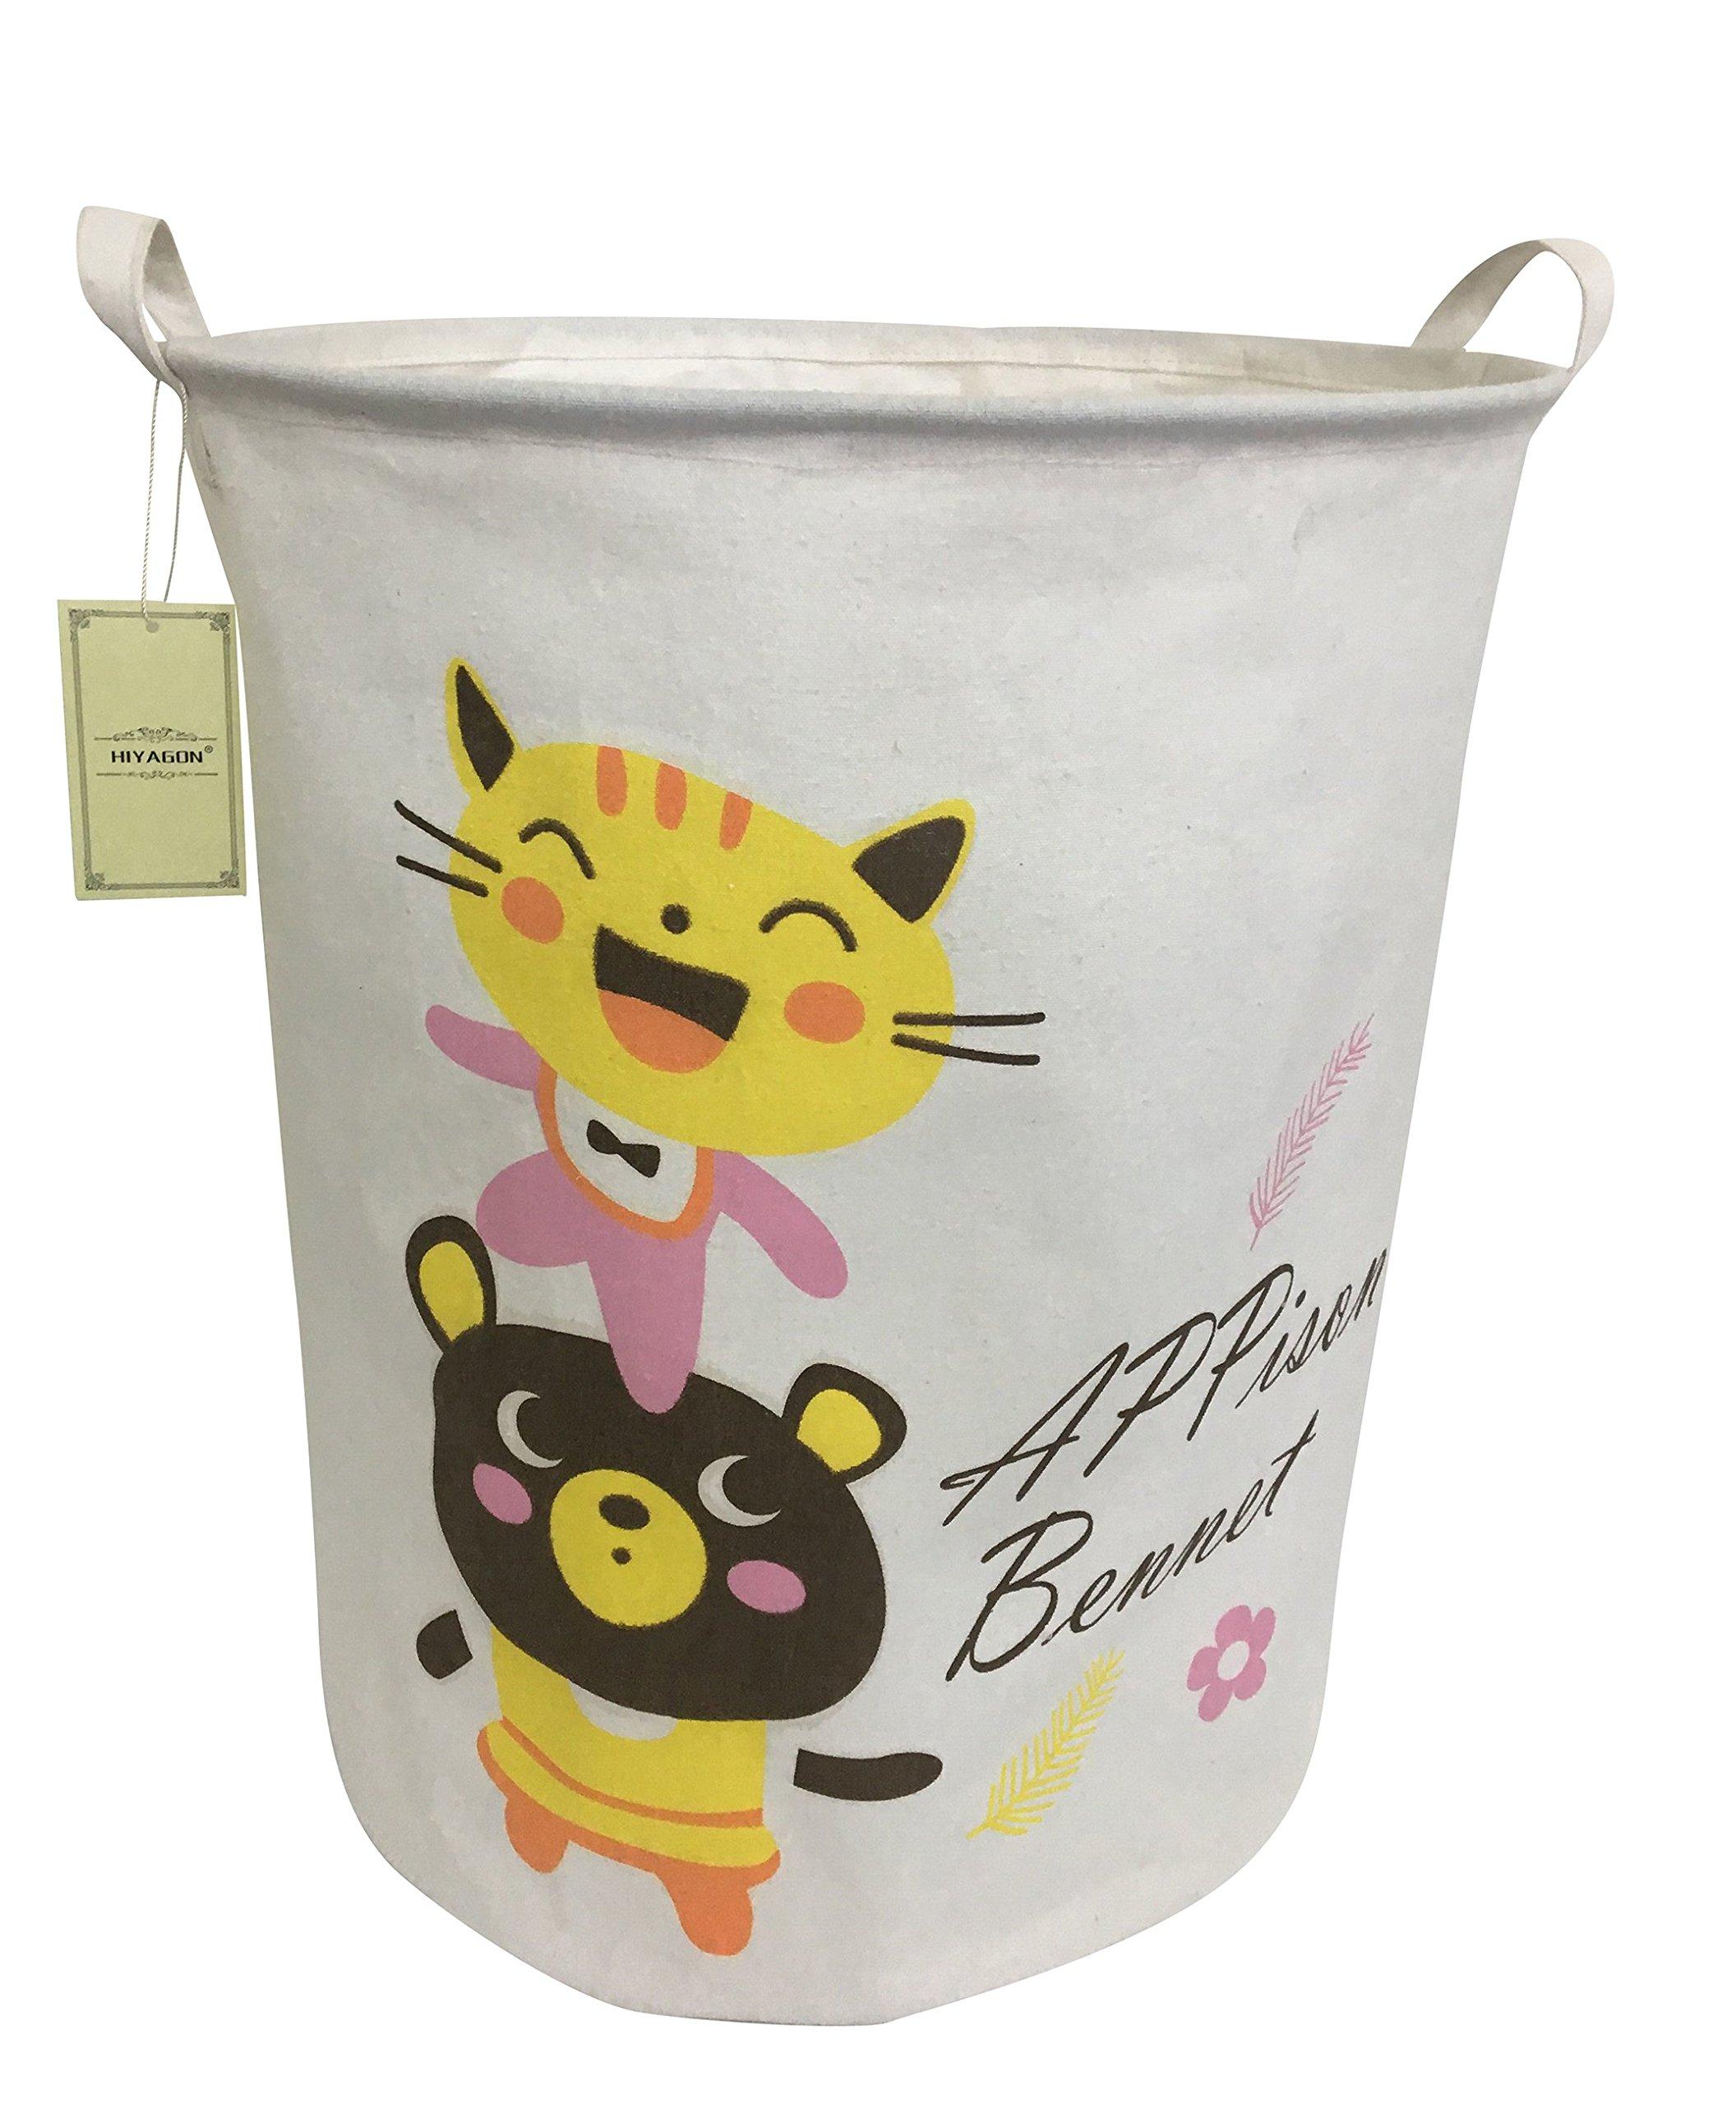 HIYAGON Large Laundry hamper with Handles-Canvas Storage Basket for Kids Room Storage Bin,animal hamper,toy hamper 19.7×15.7(cartoon)